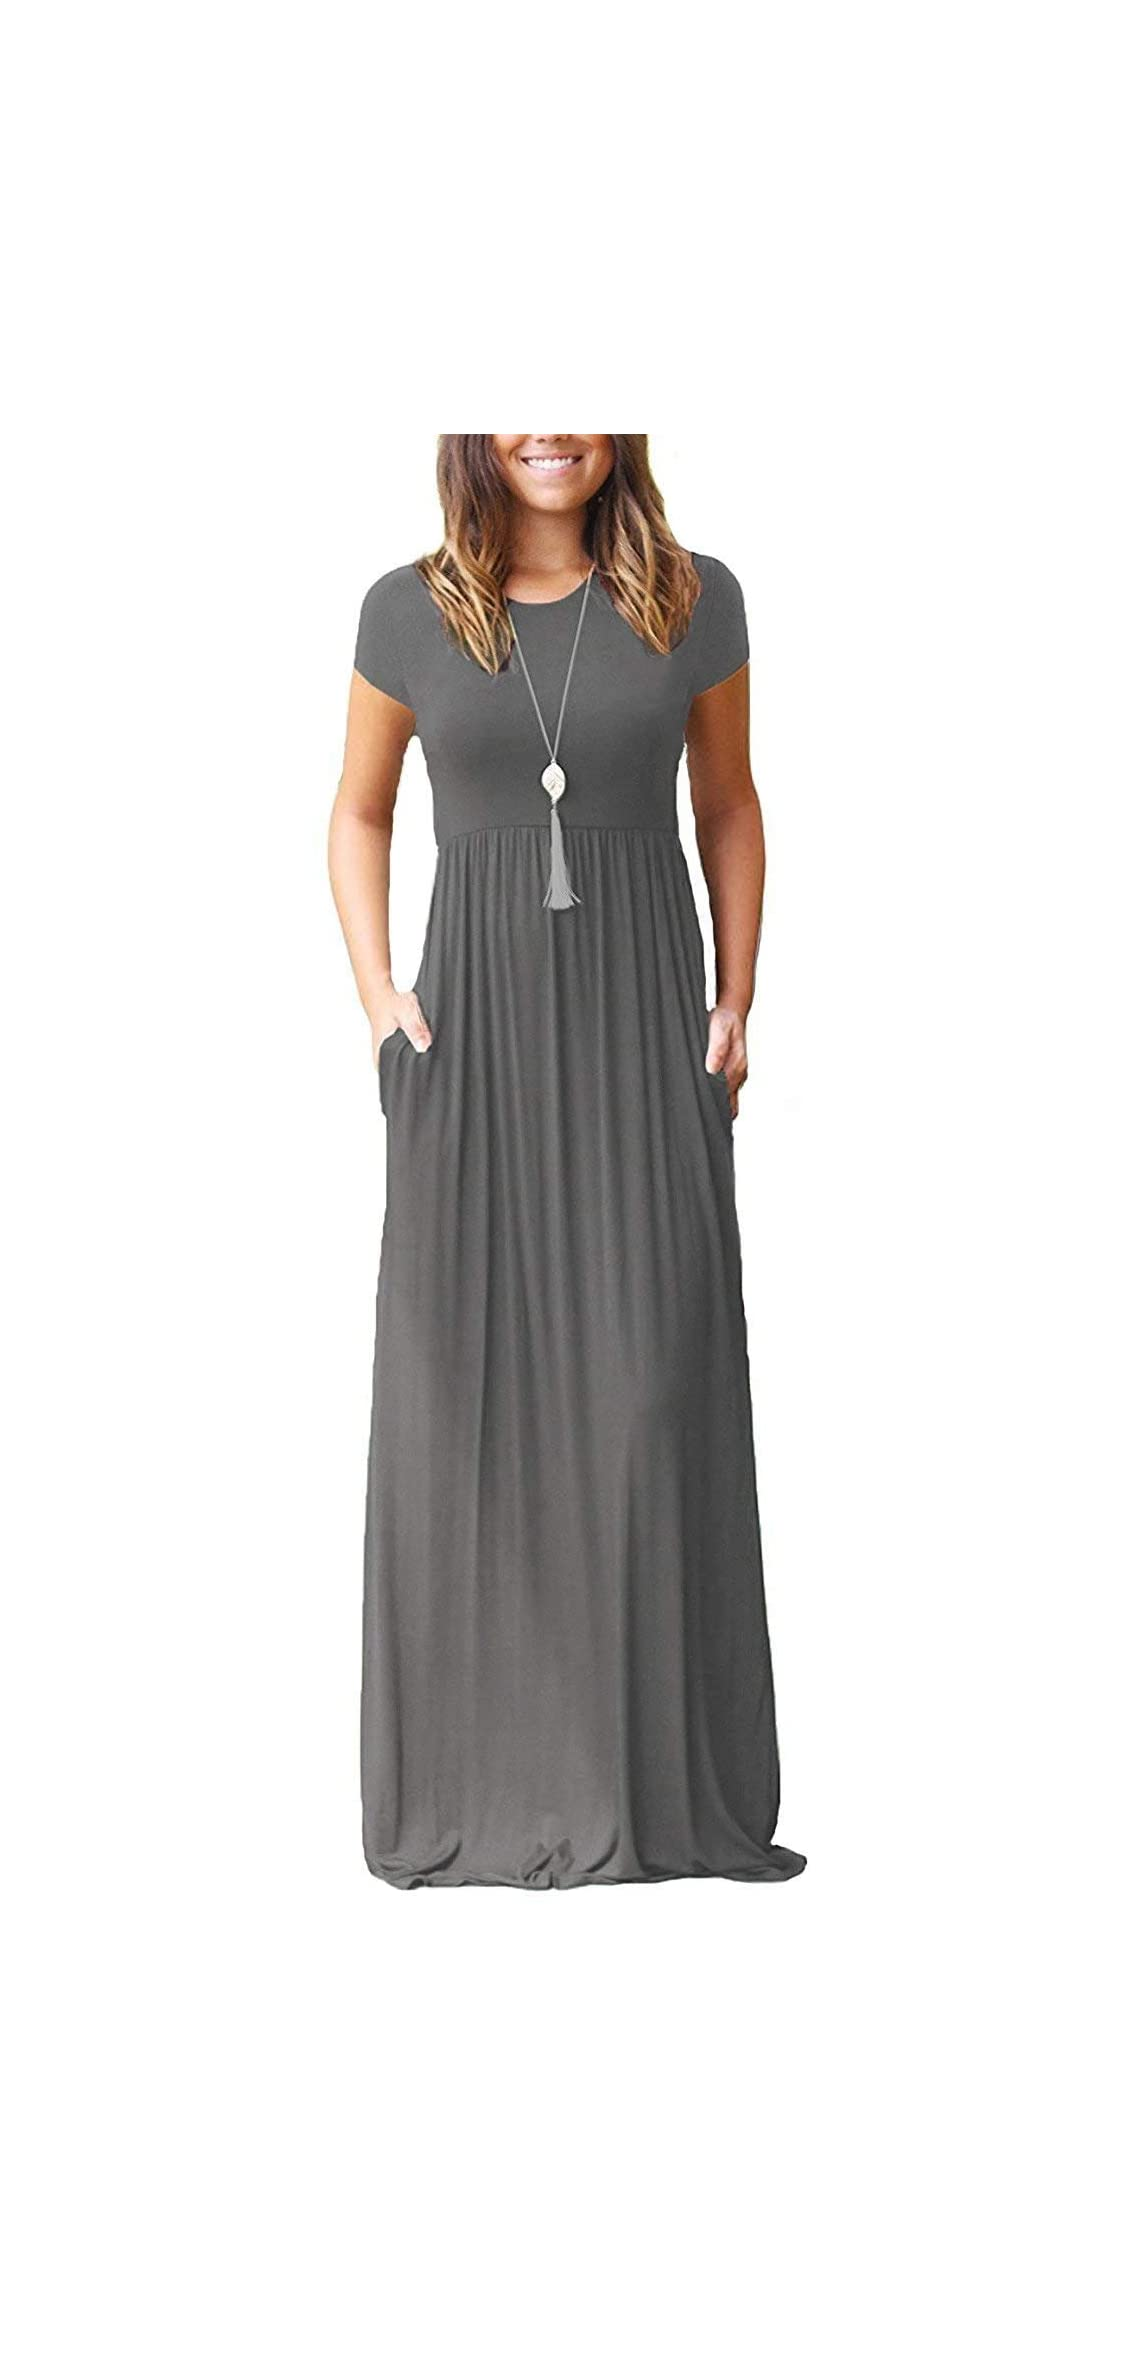 Women's Short Sleeve Loose Plain Maxi Dresses Casual